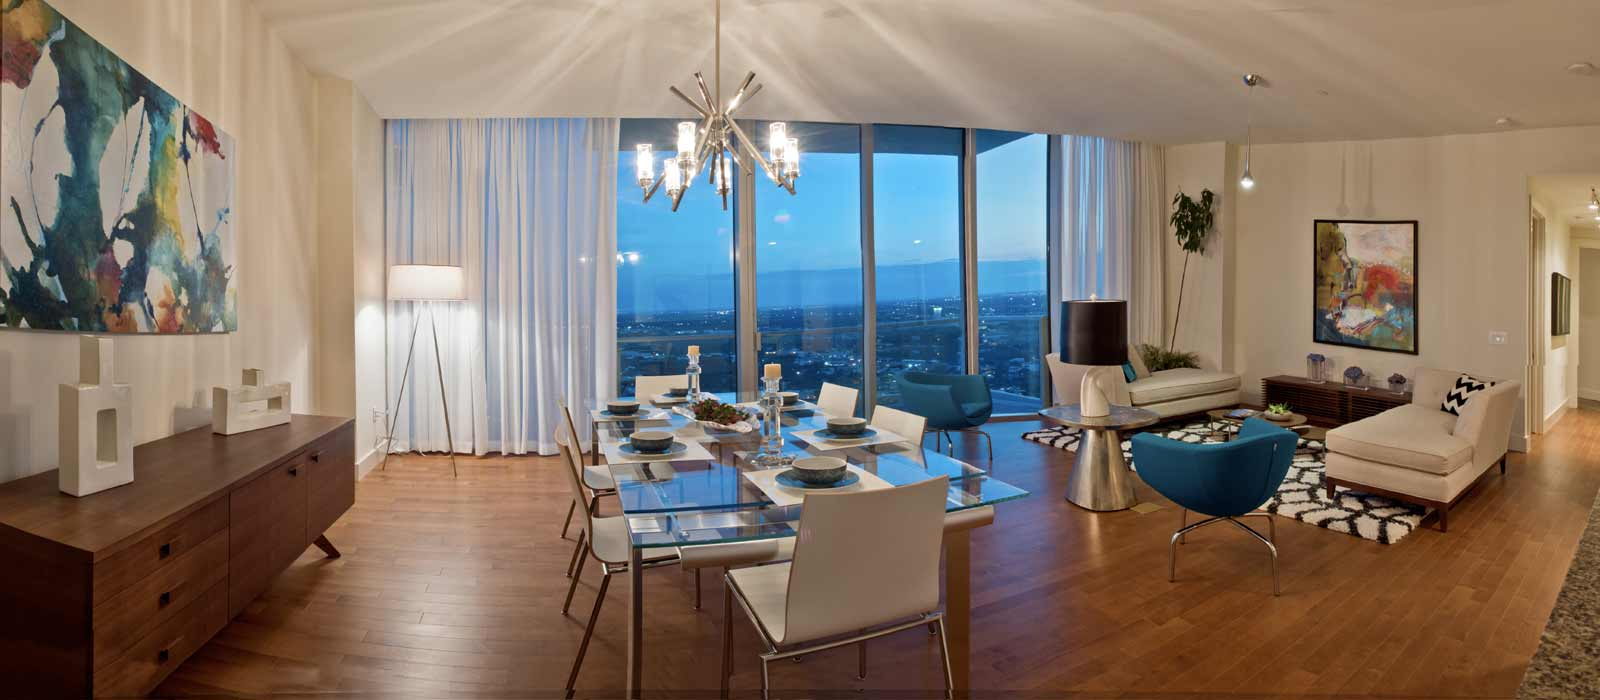 Alteza Residences Above the Grand Hyatt Product Shots